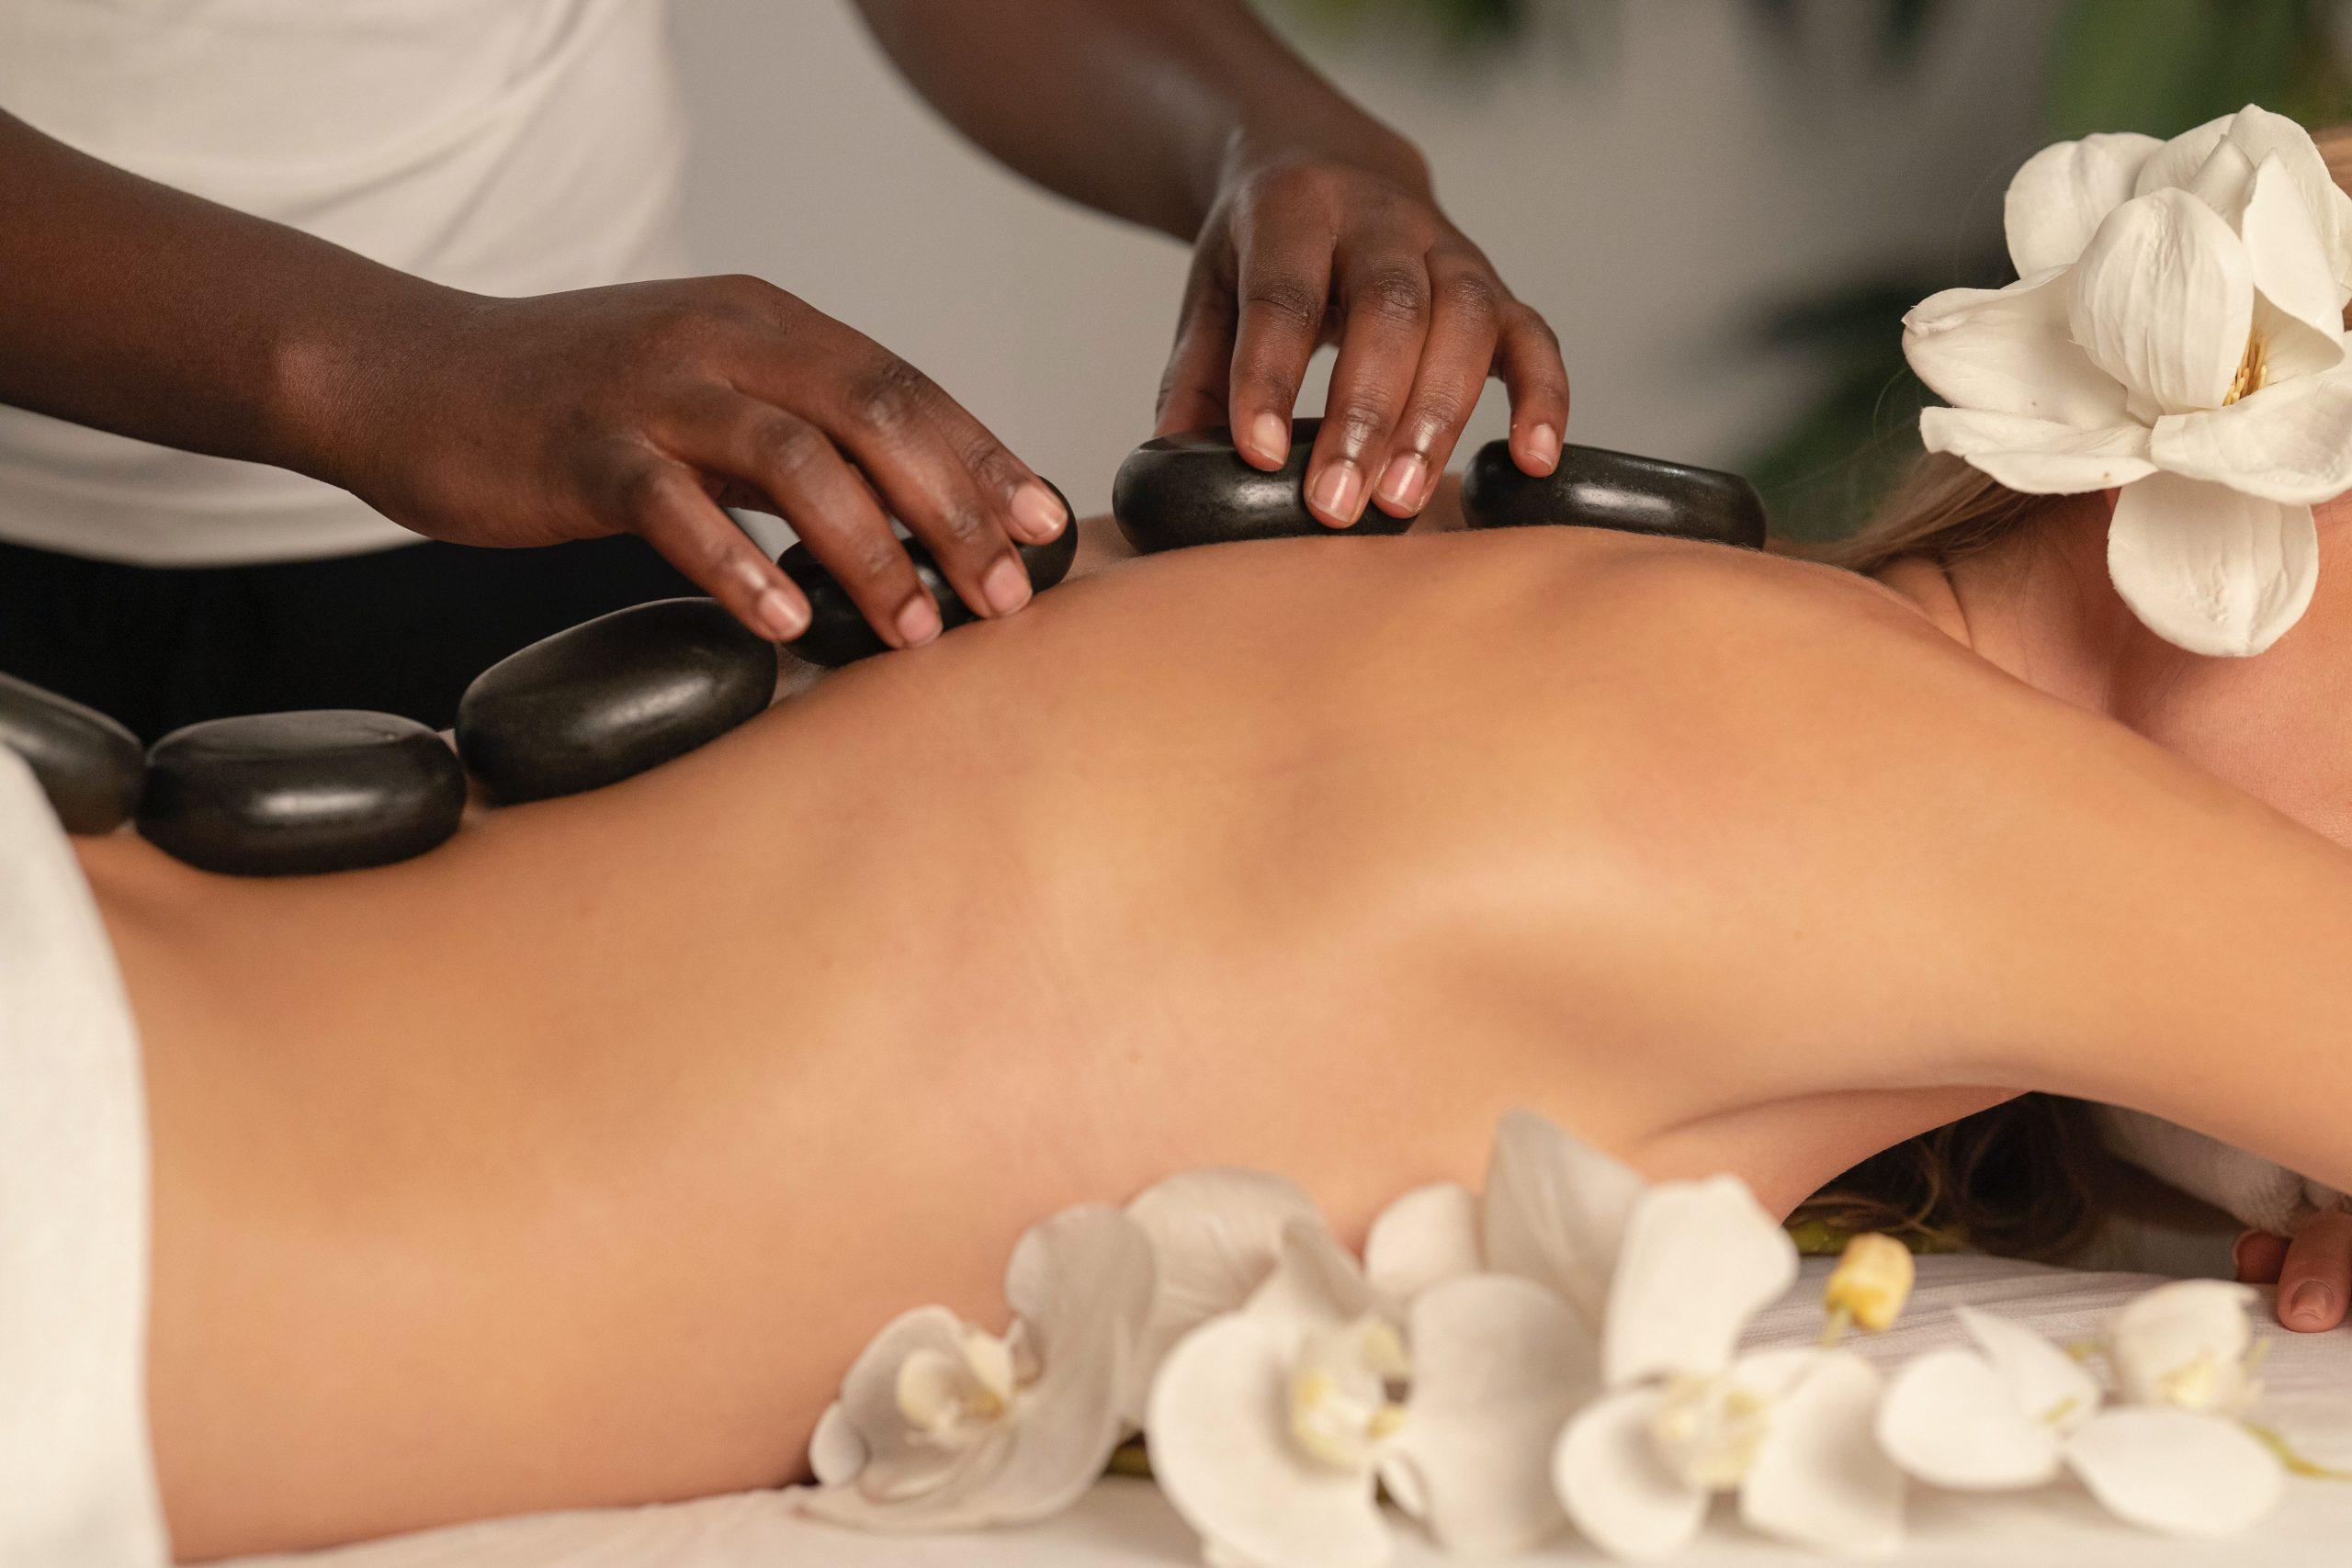 person getting a stone massage